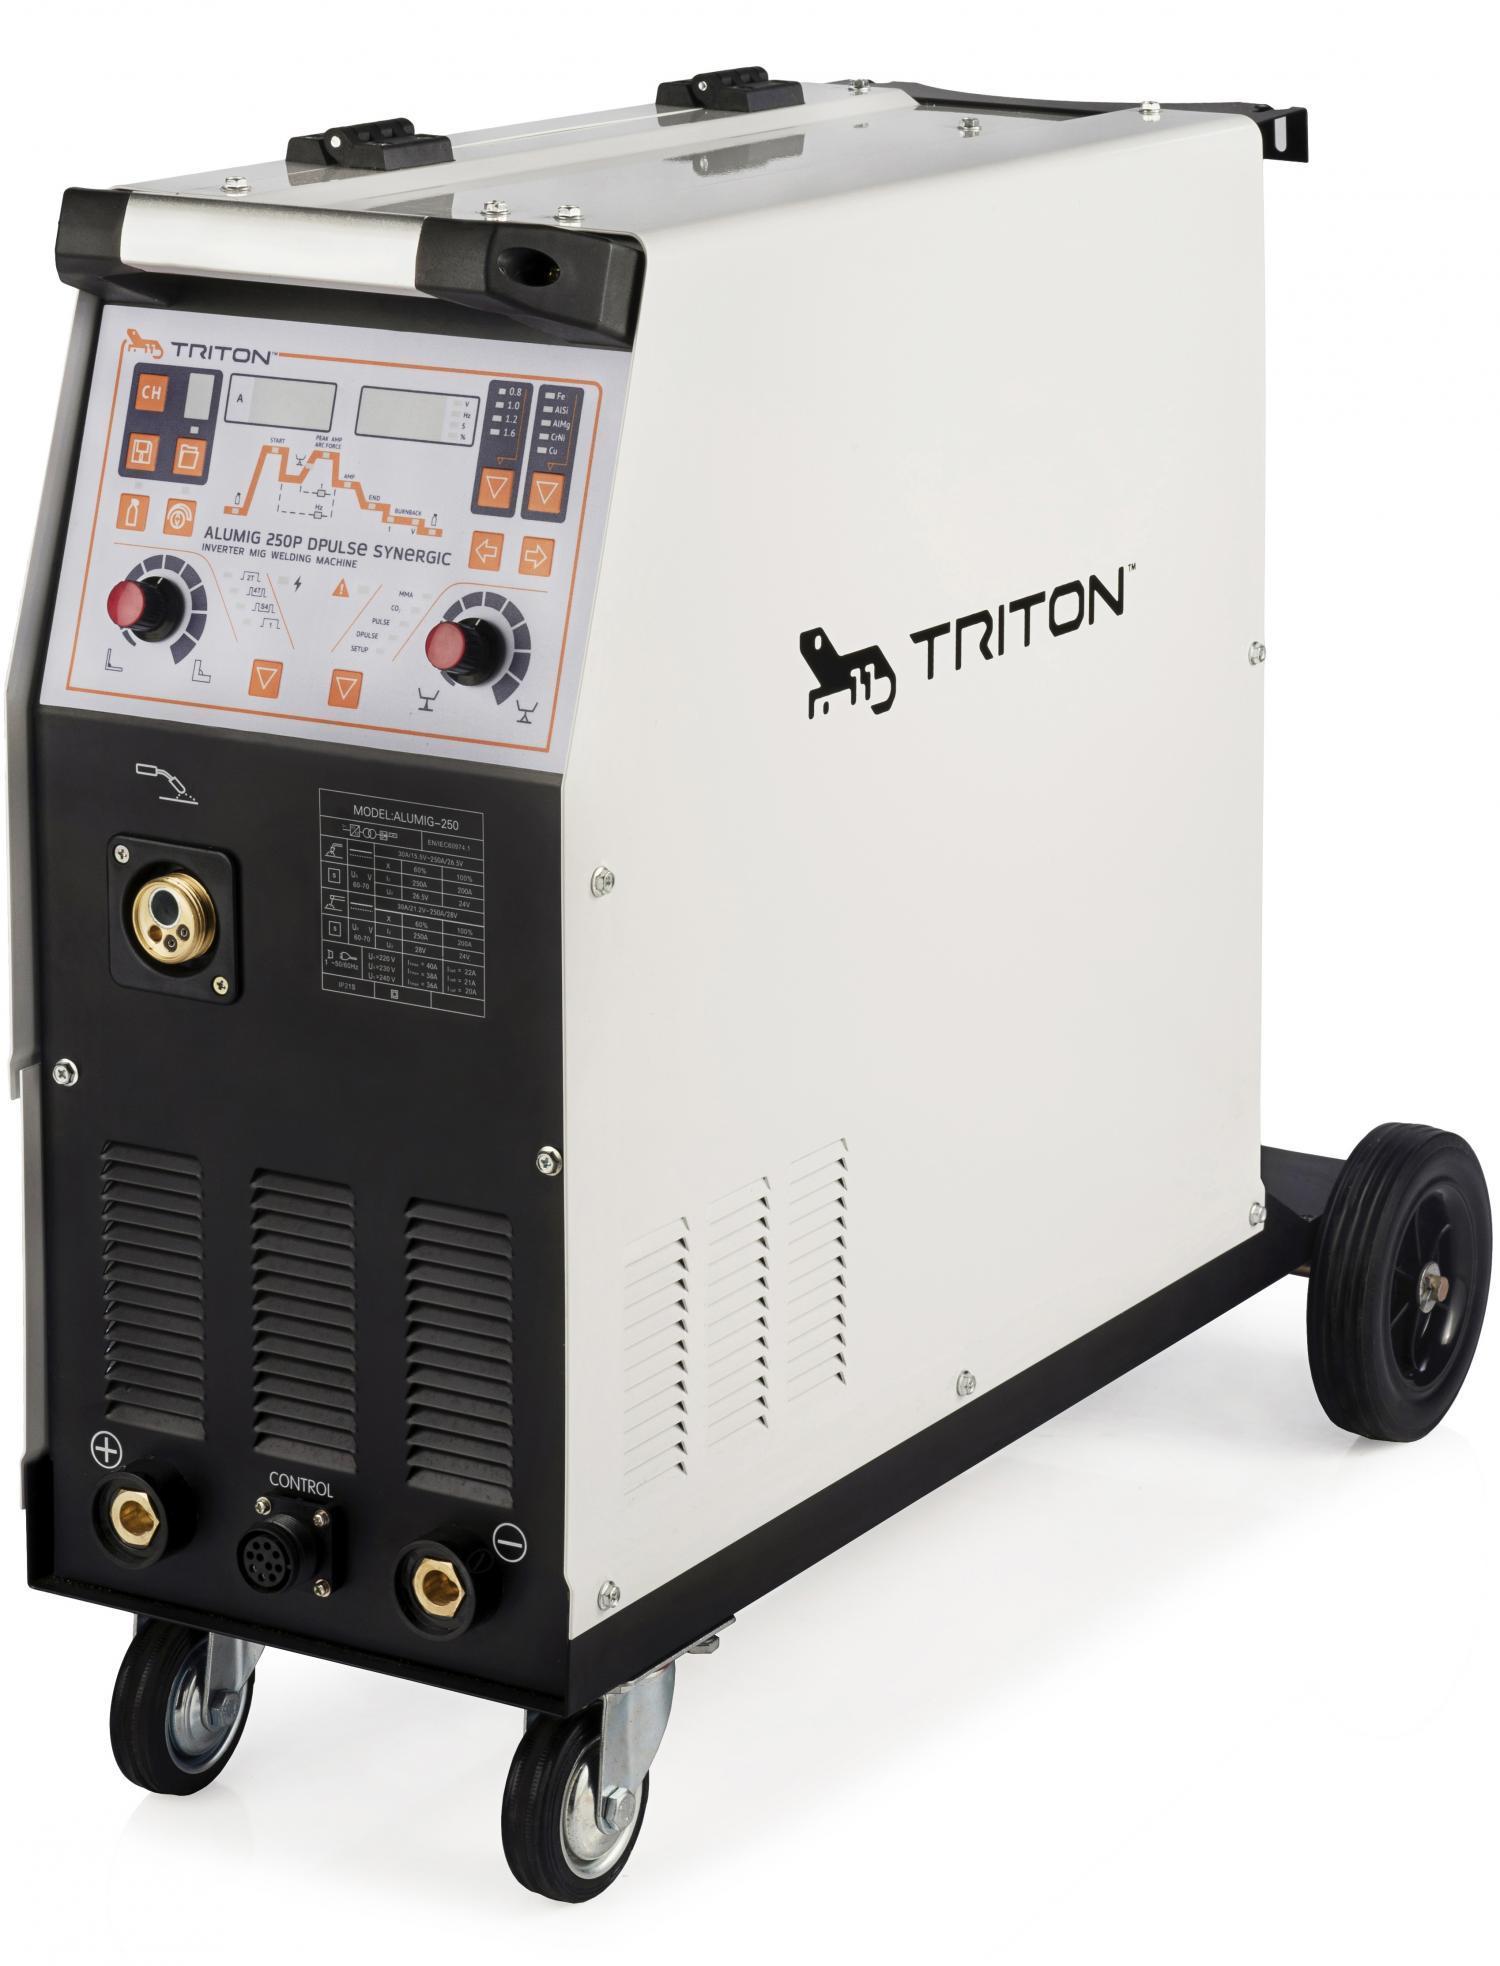 Сварочный полуавтомат TRITON ALUMIG 250P Dpulse Synergic TAMG250PDPS